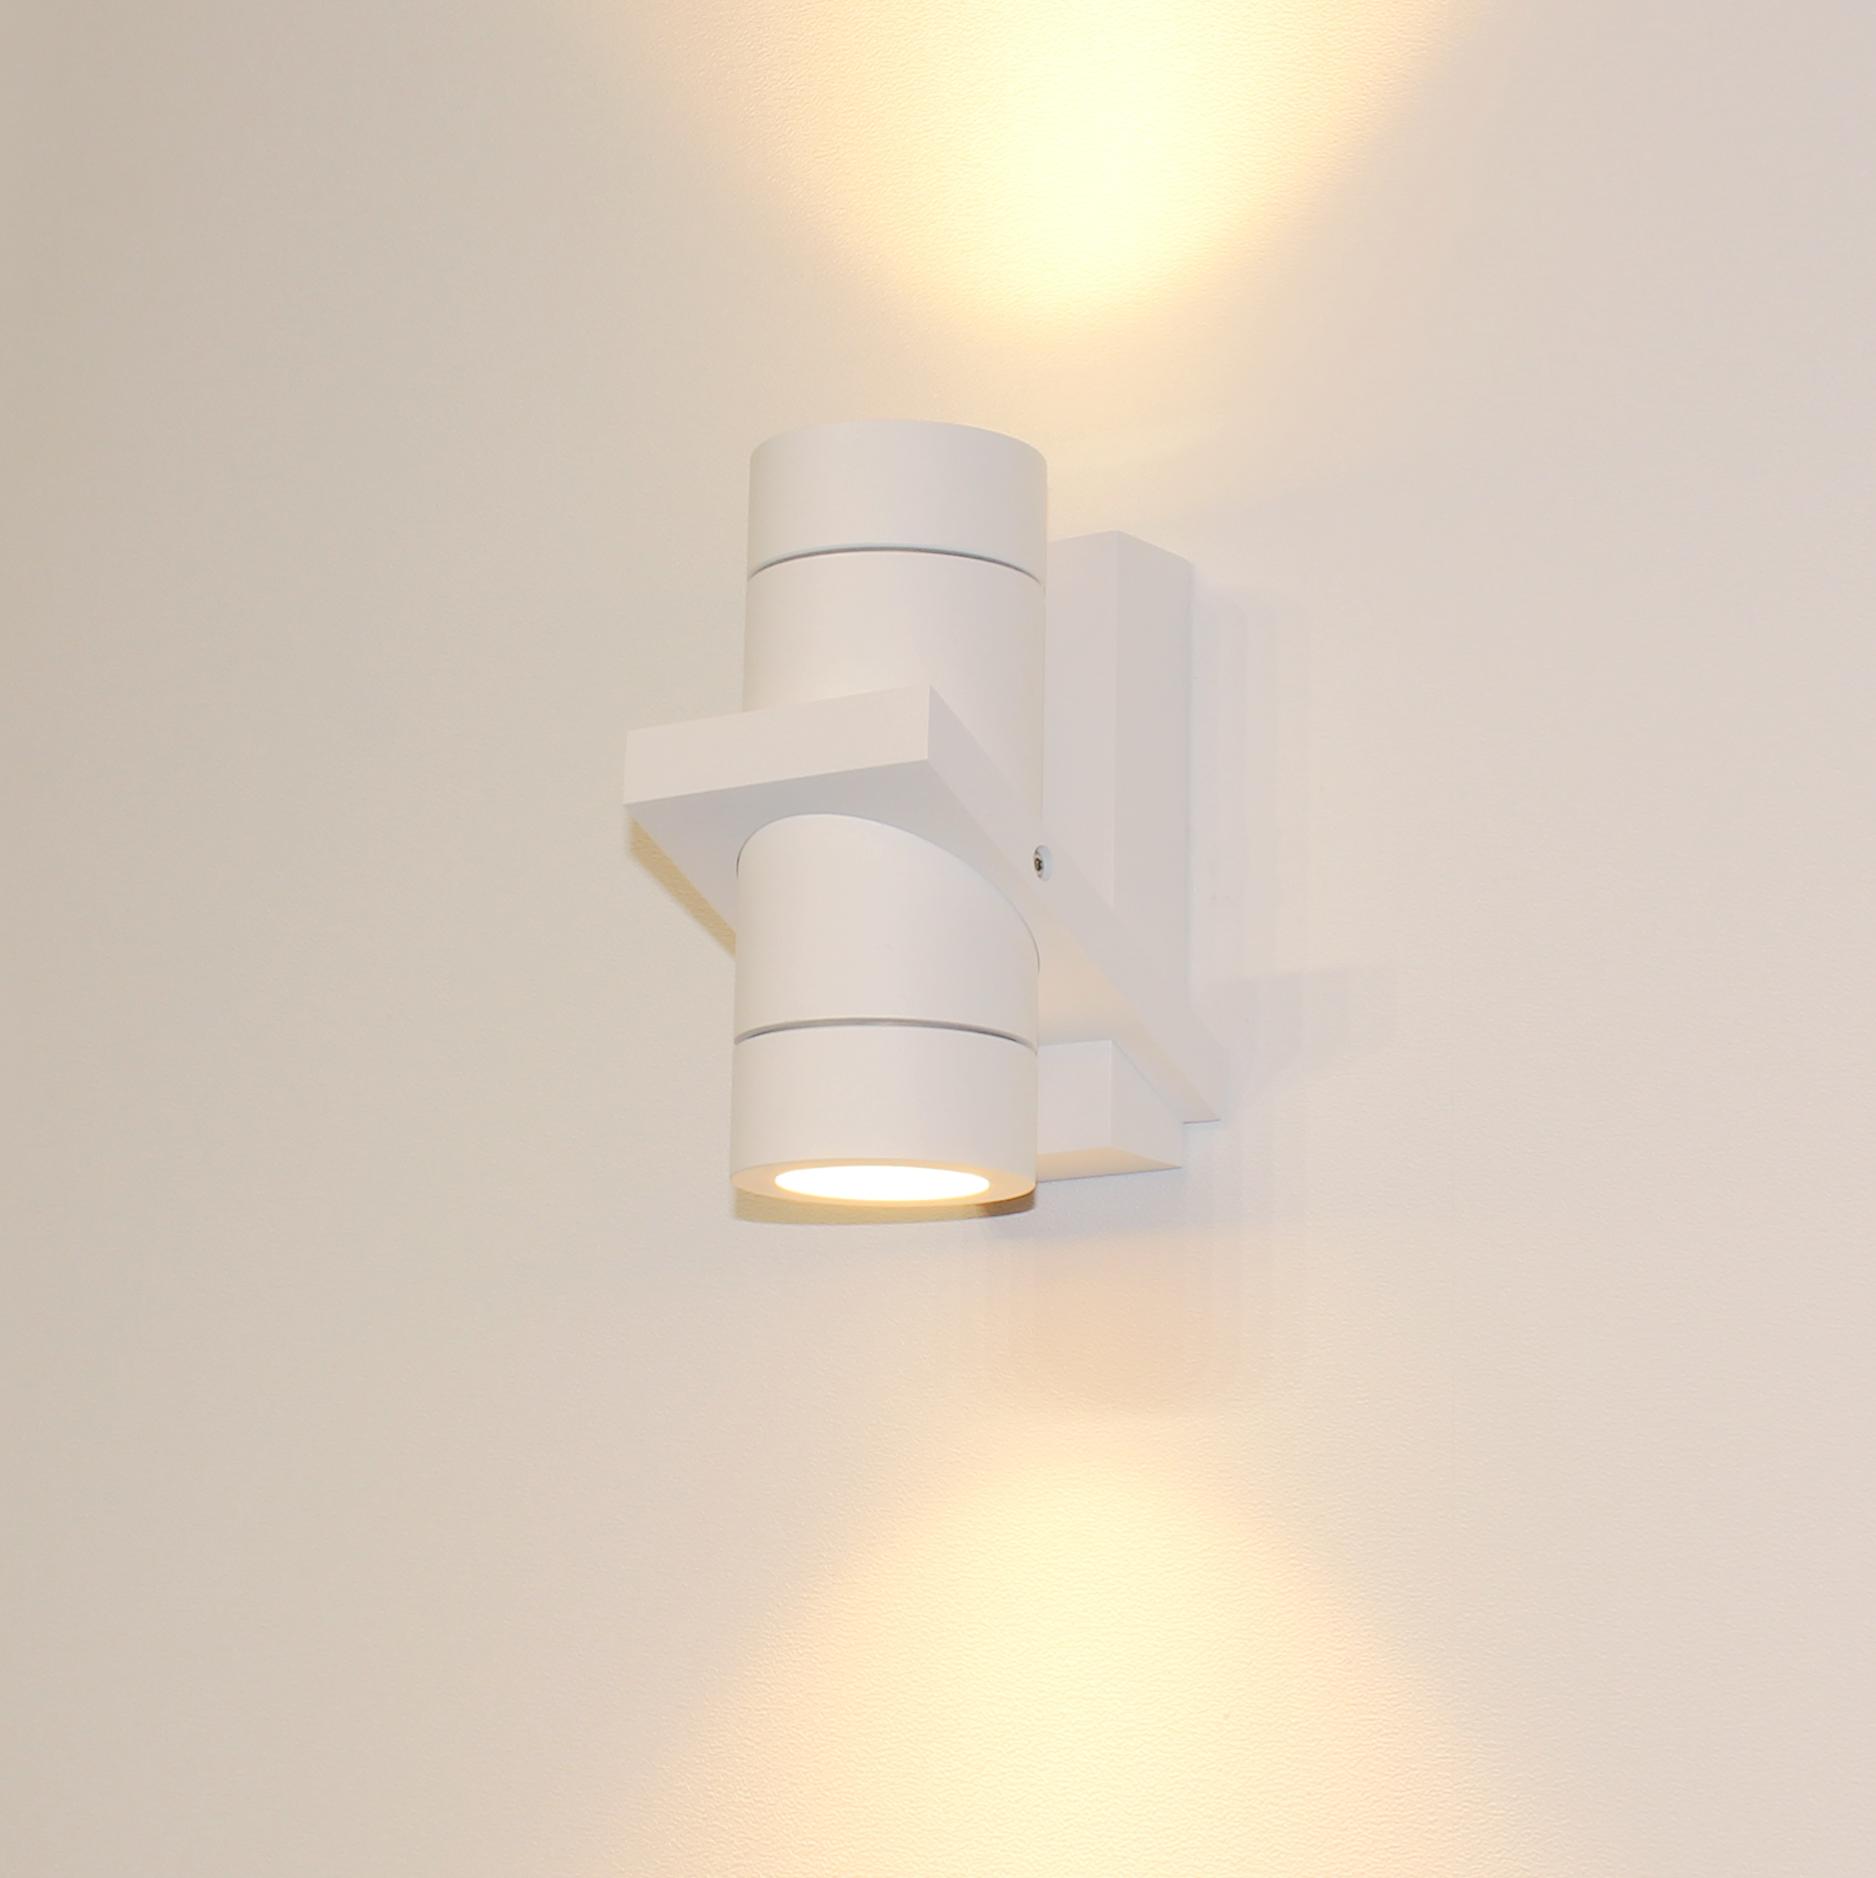 Artdelight Wandlamp Double 16 x 8,5 cm wit